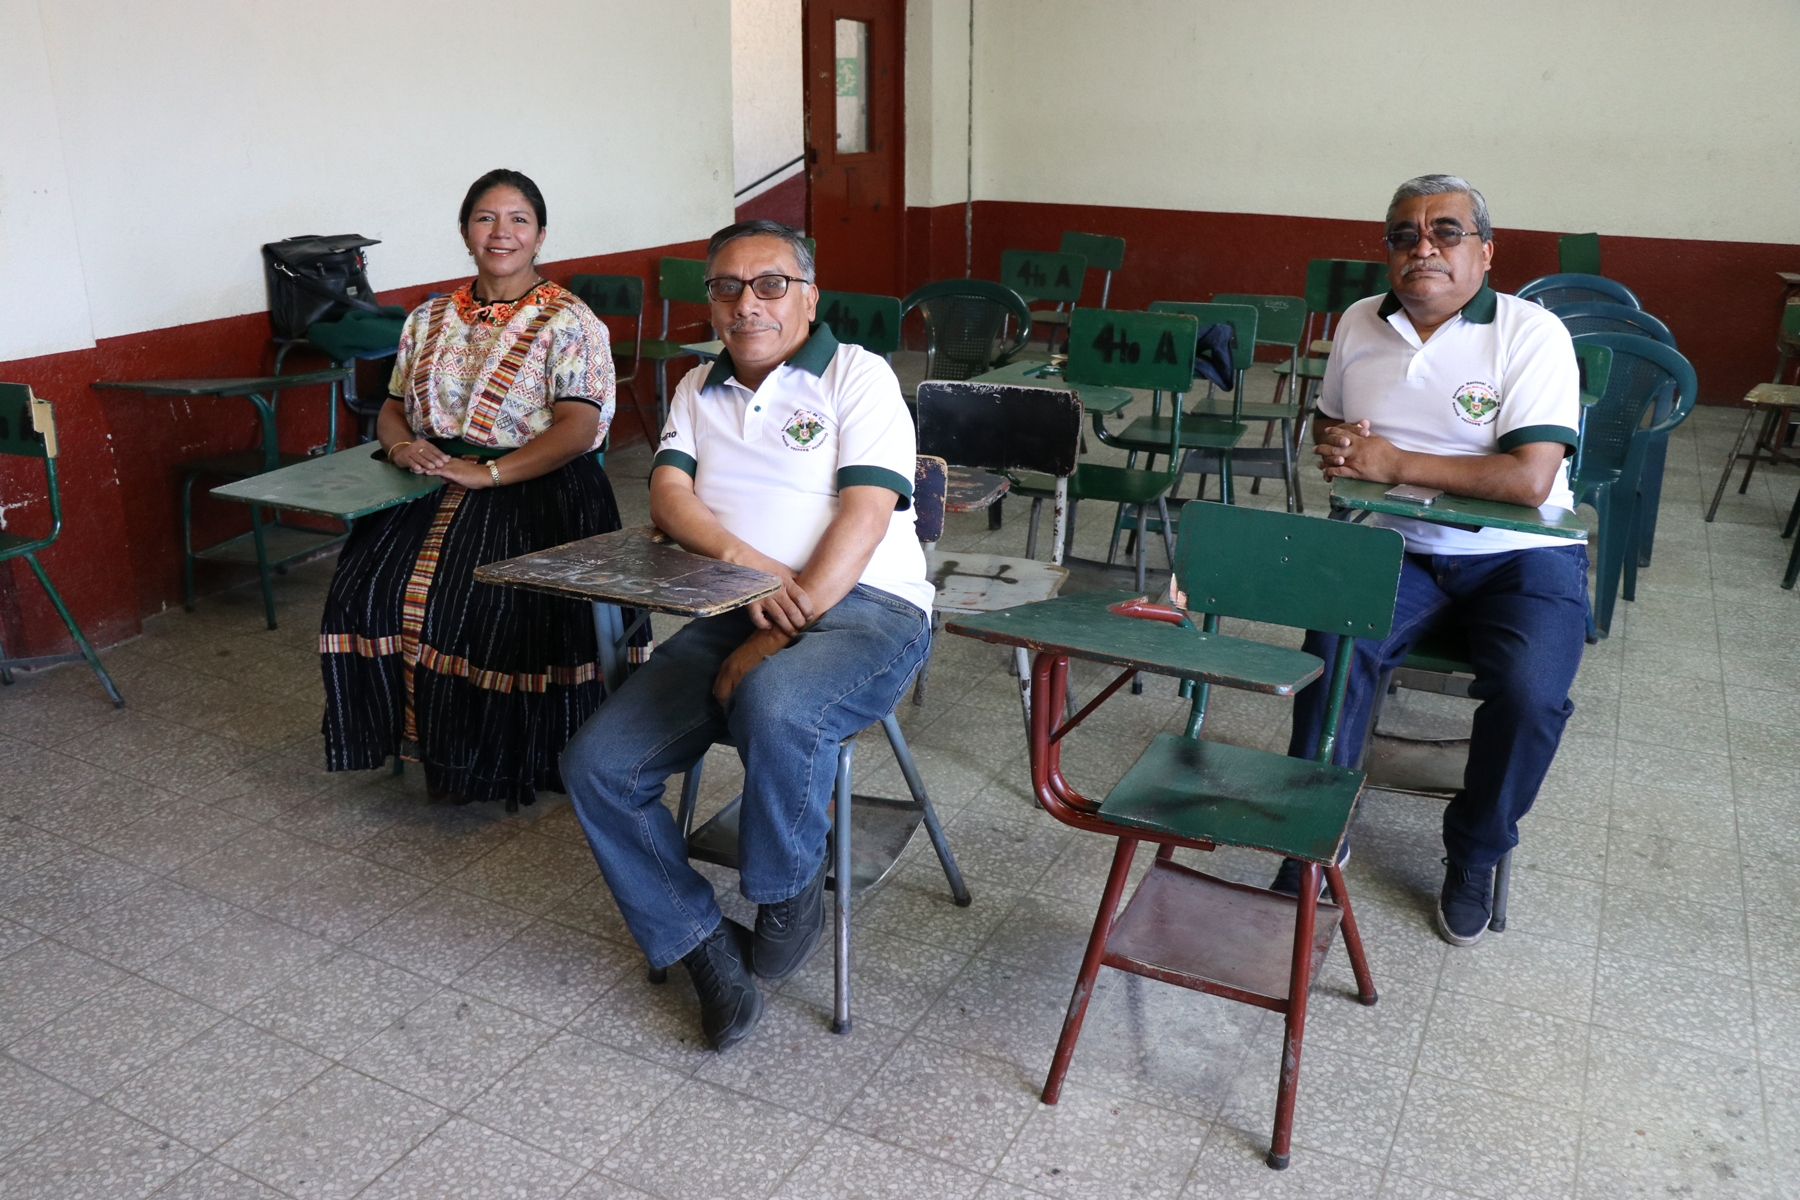 Exalumnos se reunirán en diferentes actividades para revivir anécdotas en la escuela. (Foto Prensa Libe: María Longo)